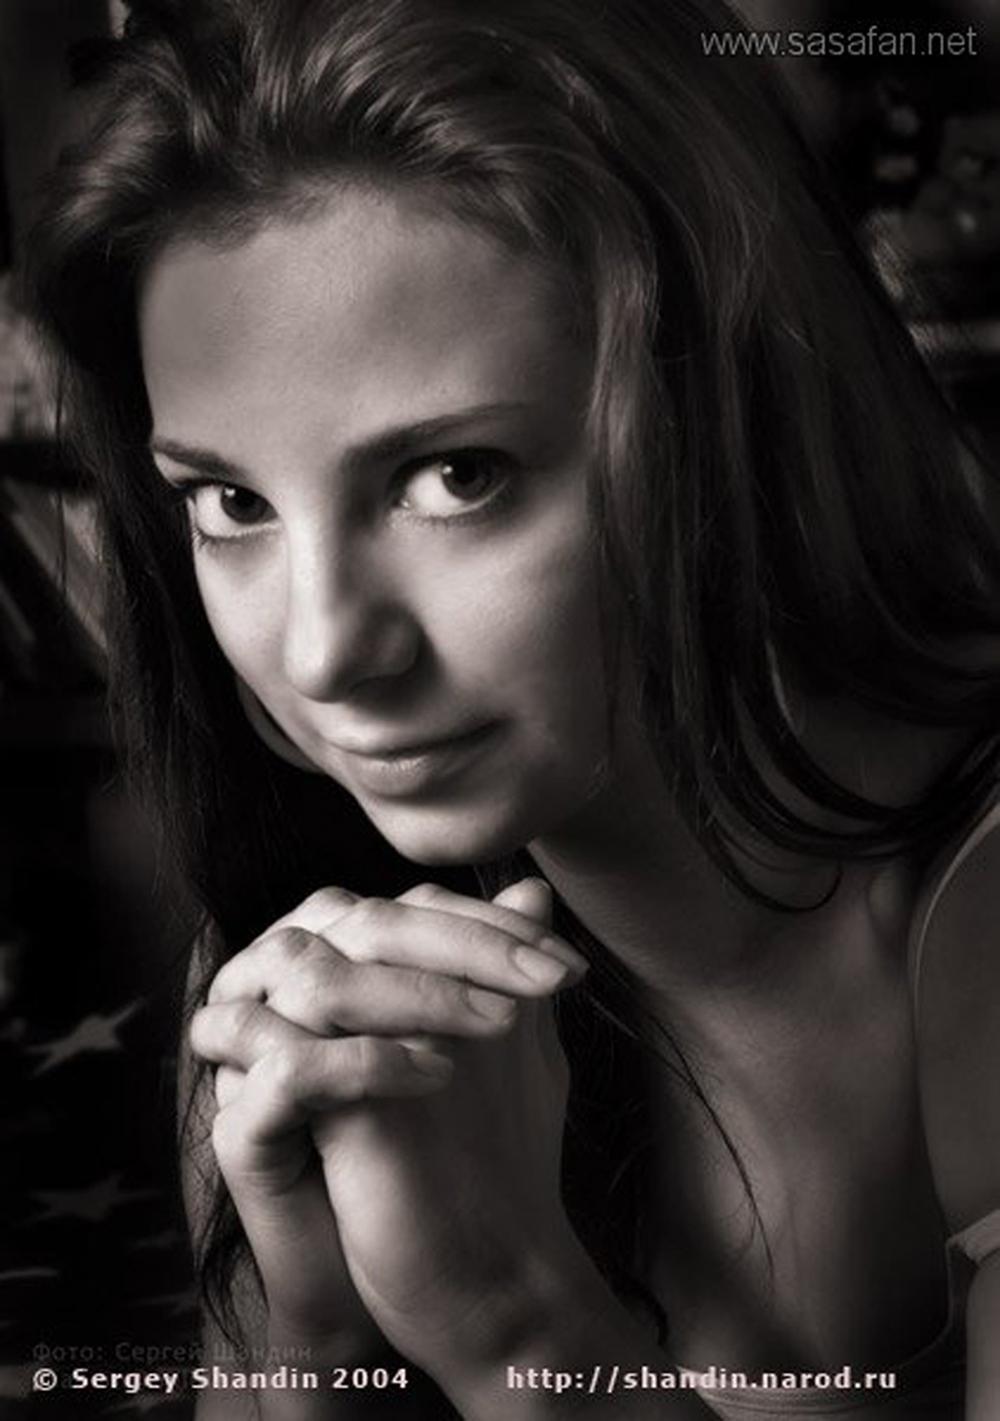 Светлана смирнова марцинкевич фото ню 4 фотография